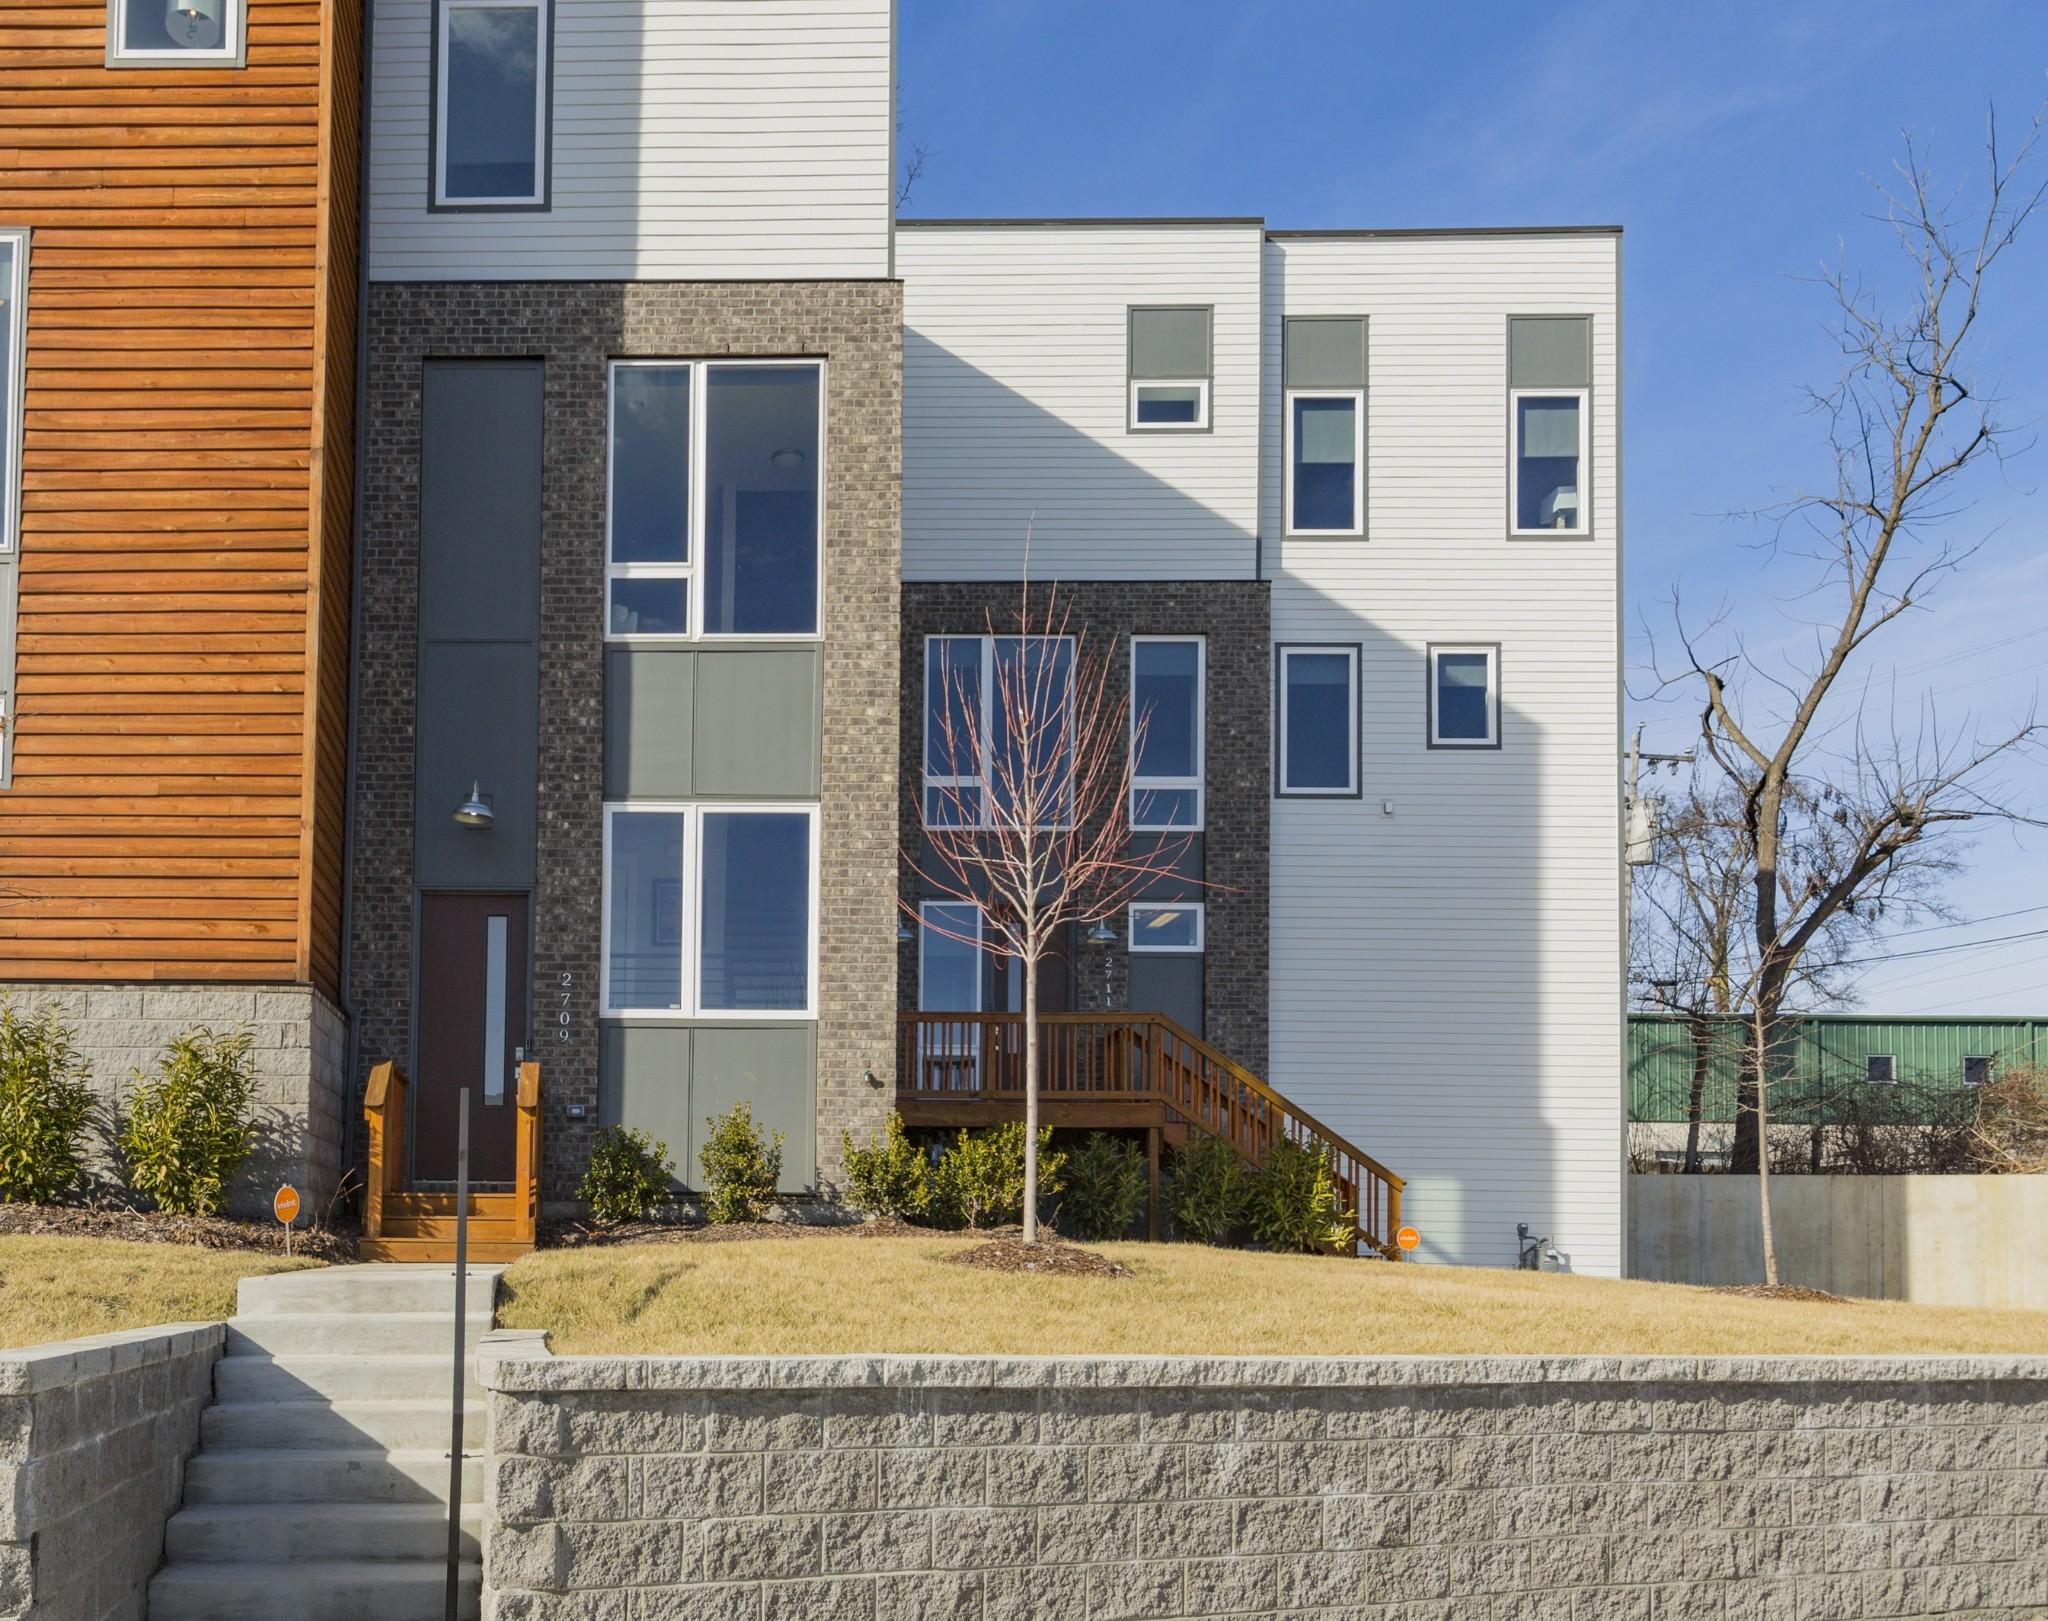 2711 Biloxi Ave Property Photo - Nashville, TN real estate listing